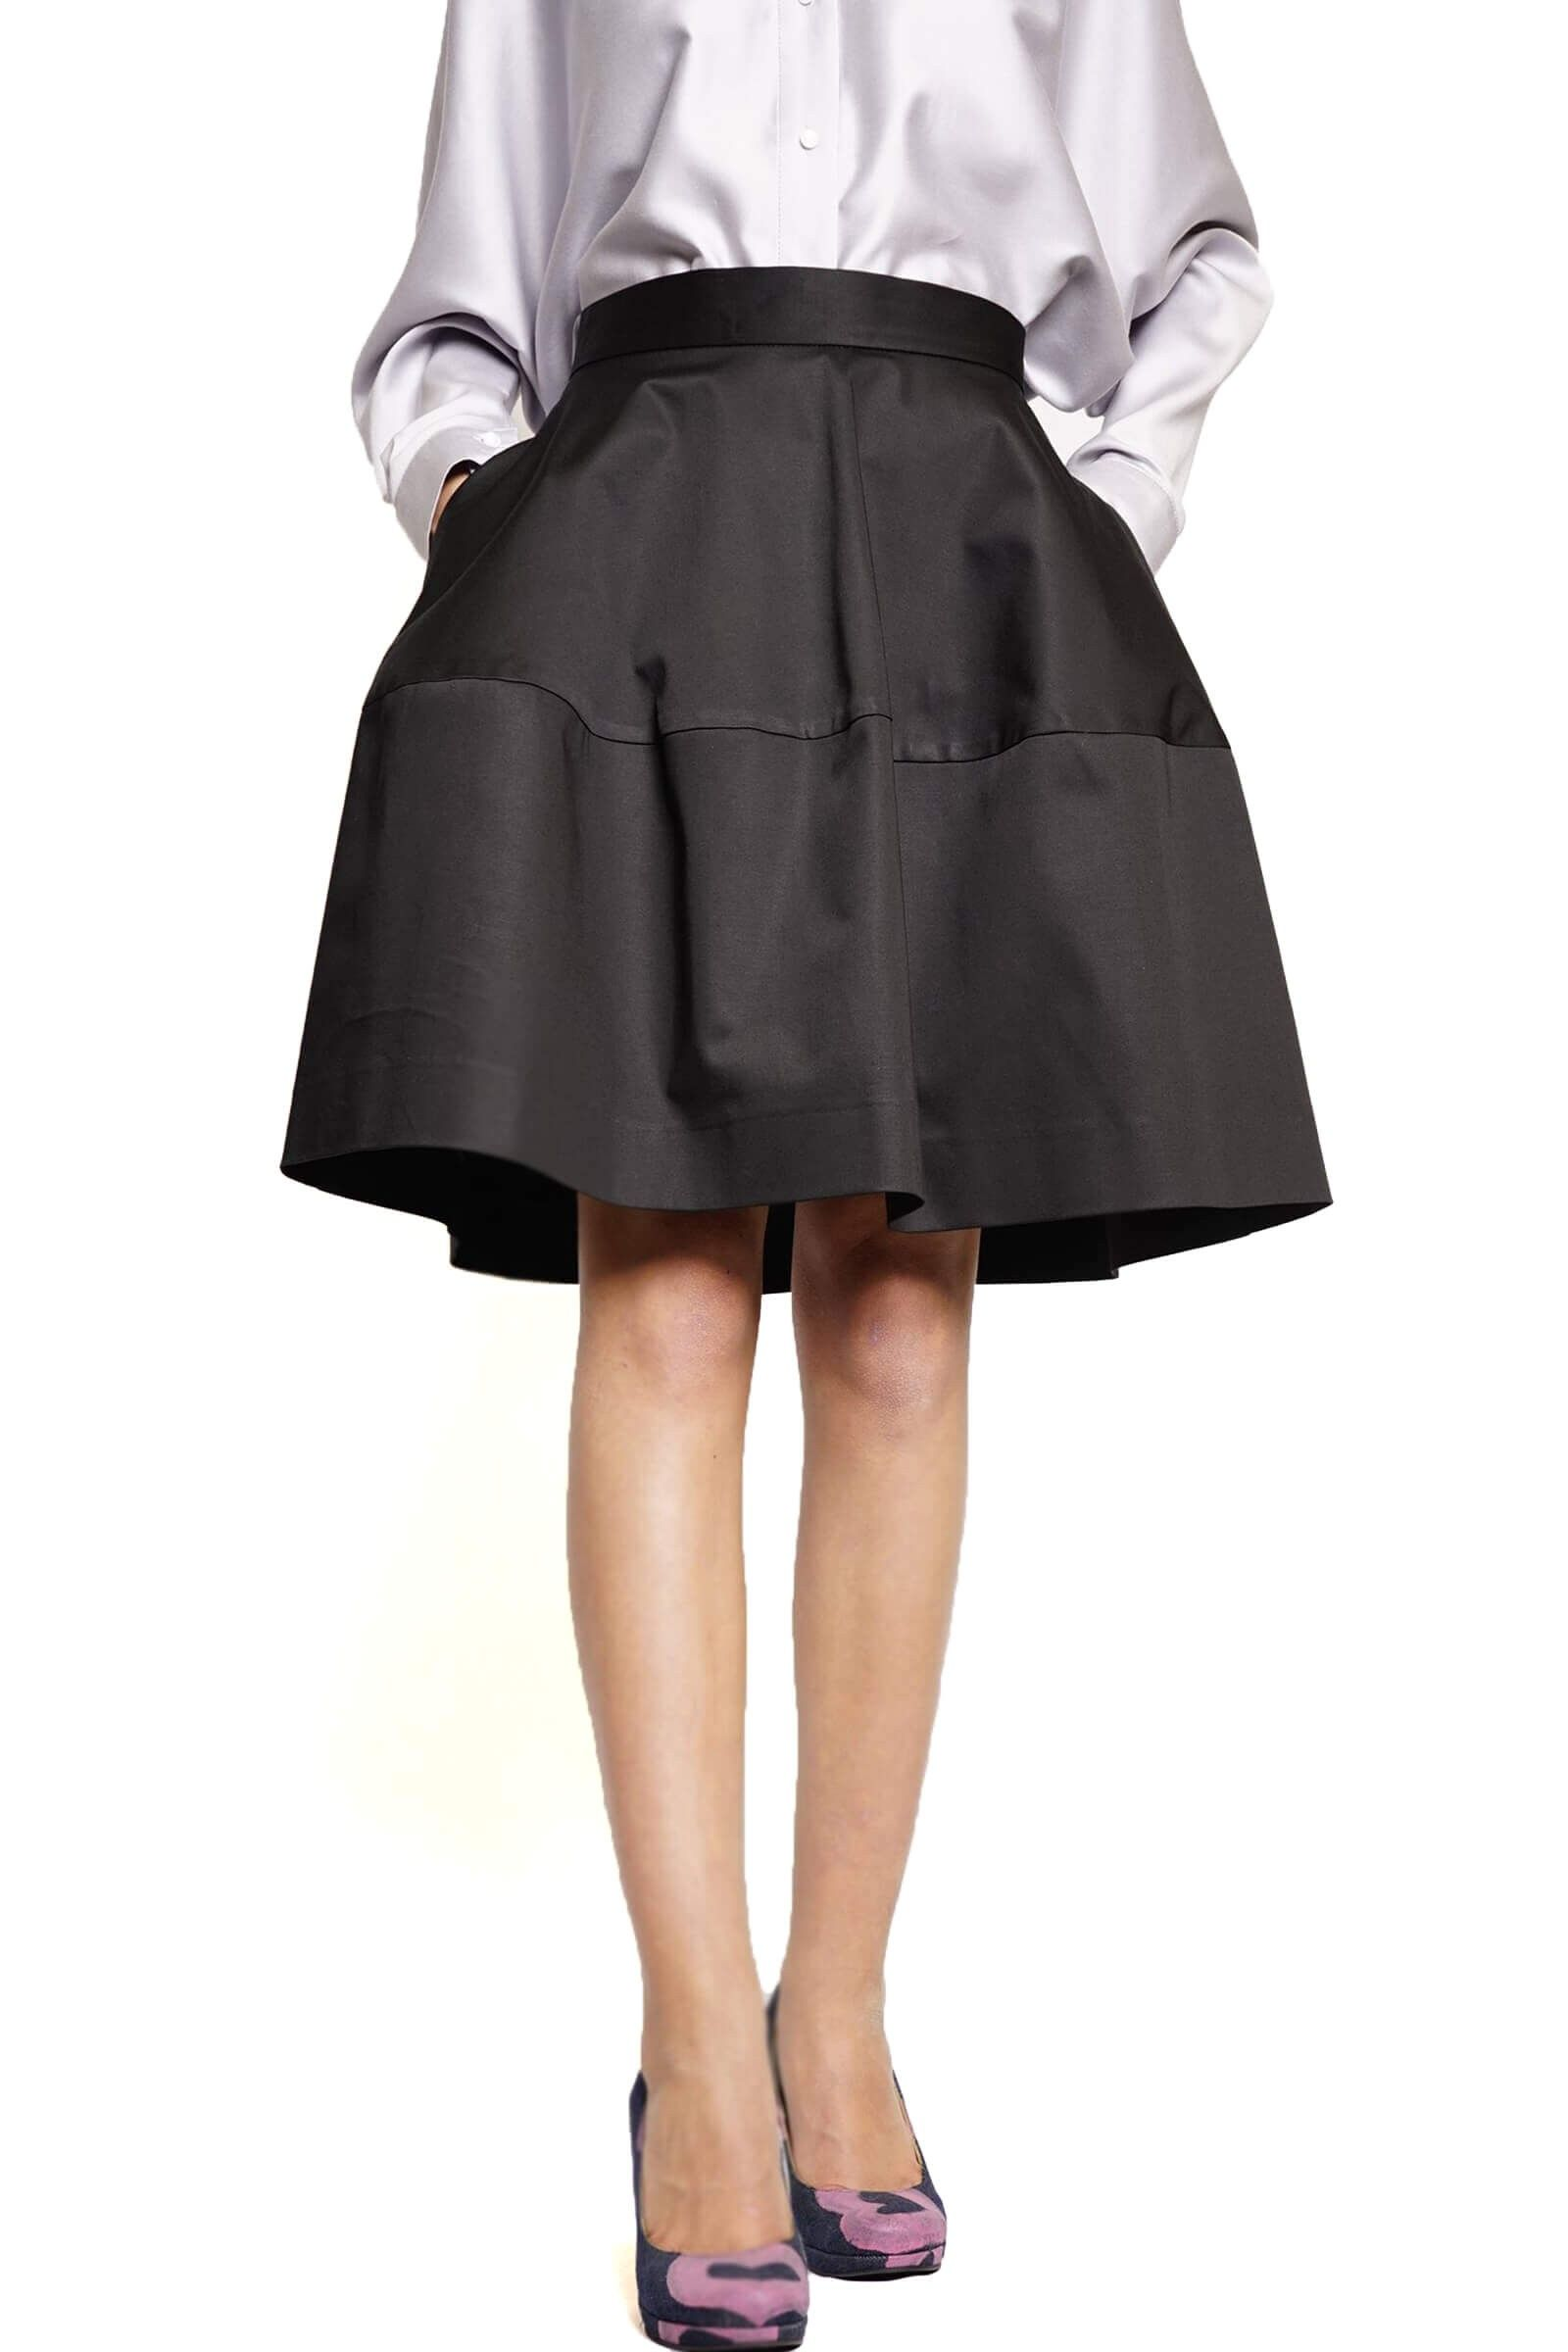 Black cotton closed skirt